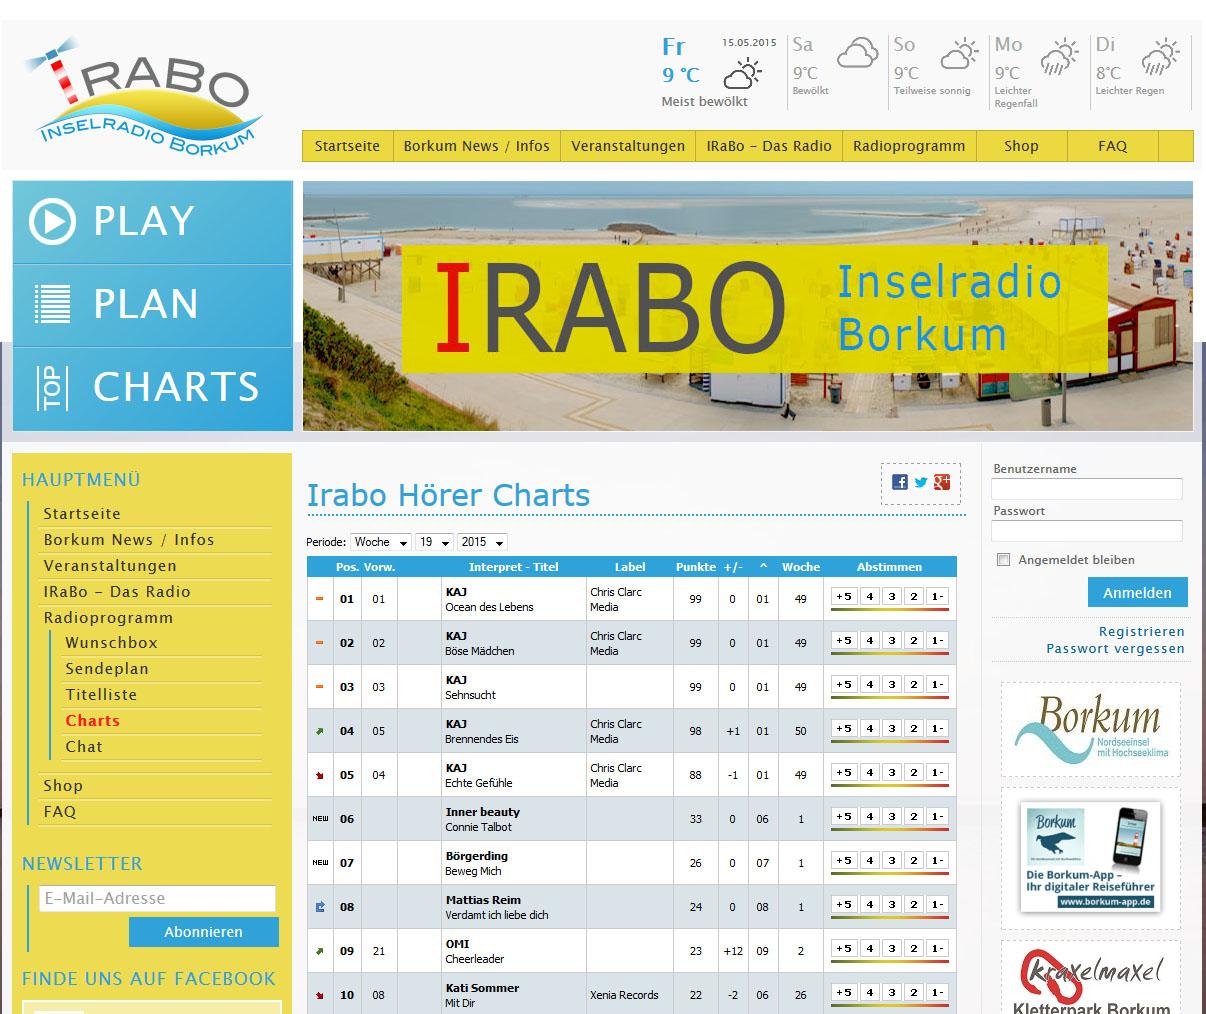 Irabo Charts - IRABO - Inselradio Borkum